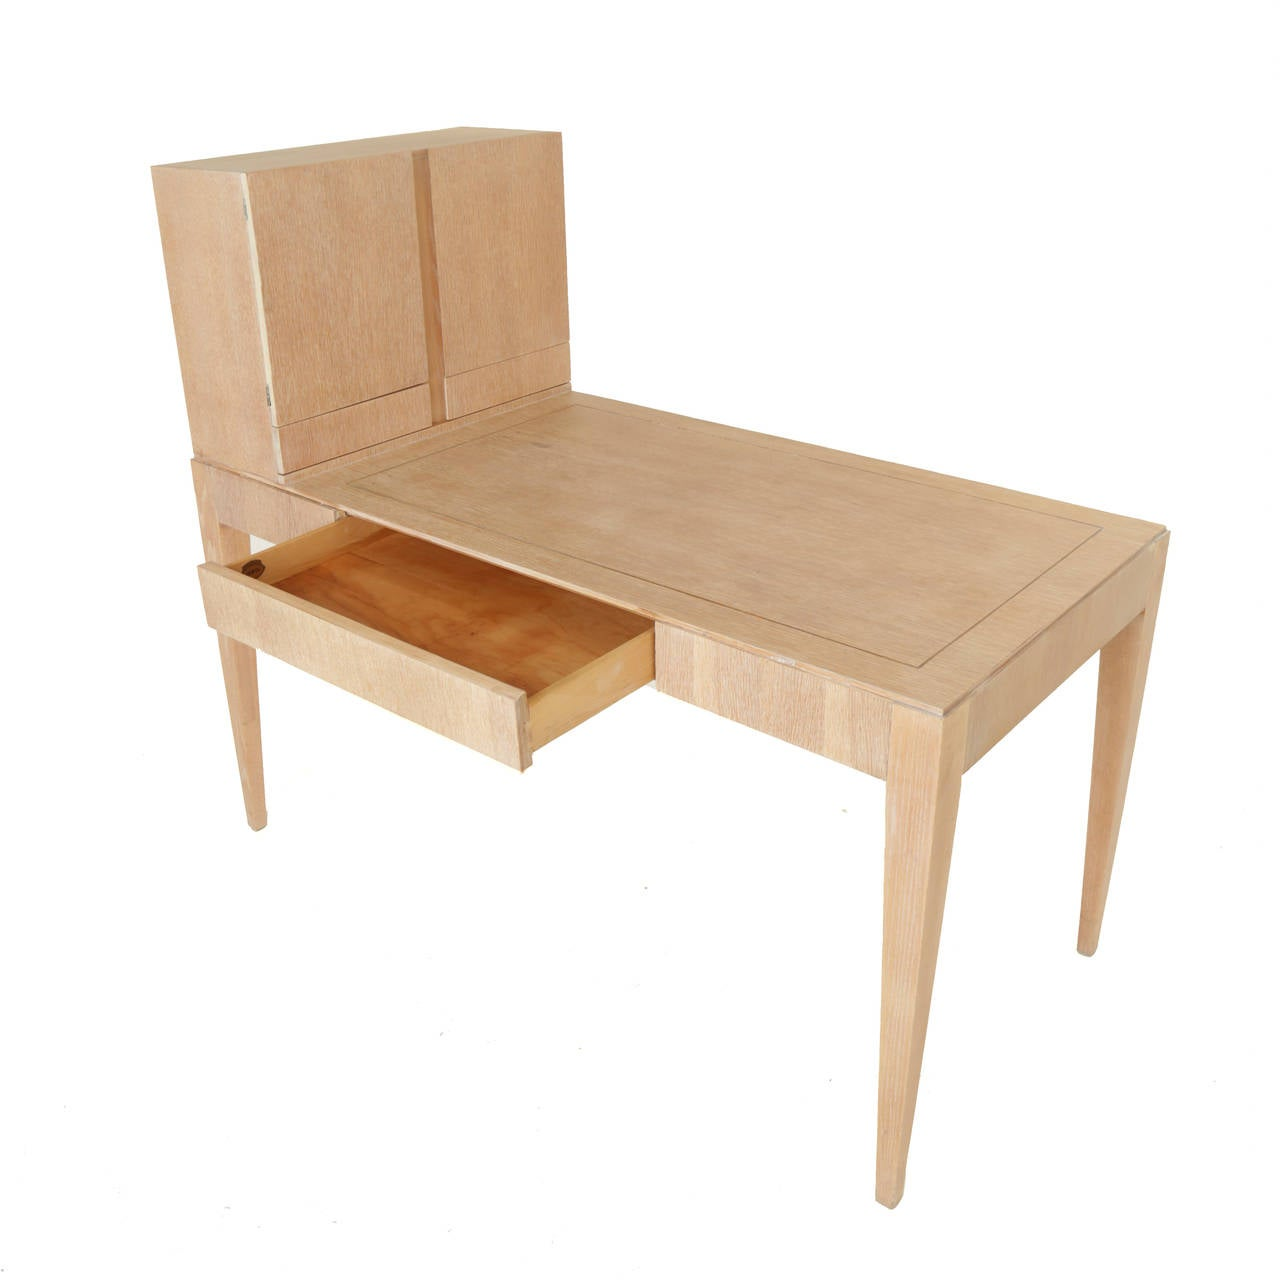 Oiled Oak Secretary Desk by Irwin with Letter Cabinet For Sale